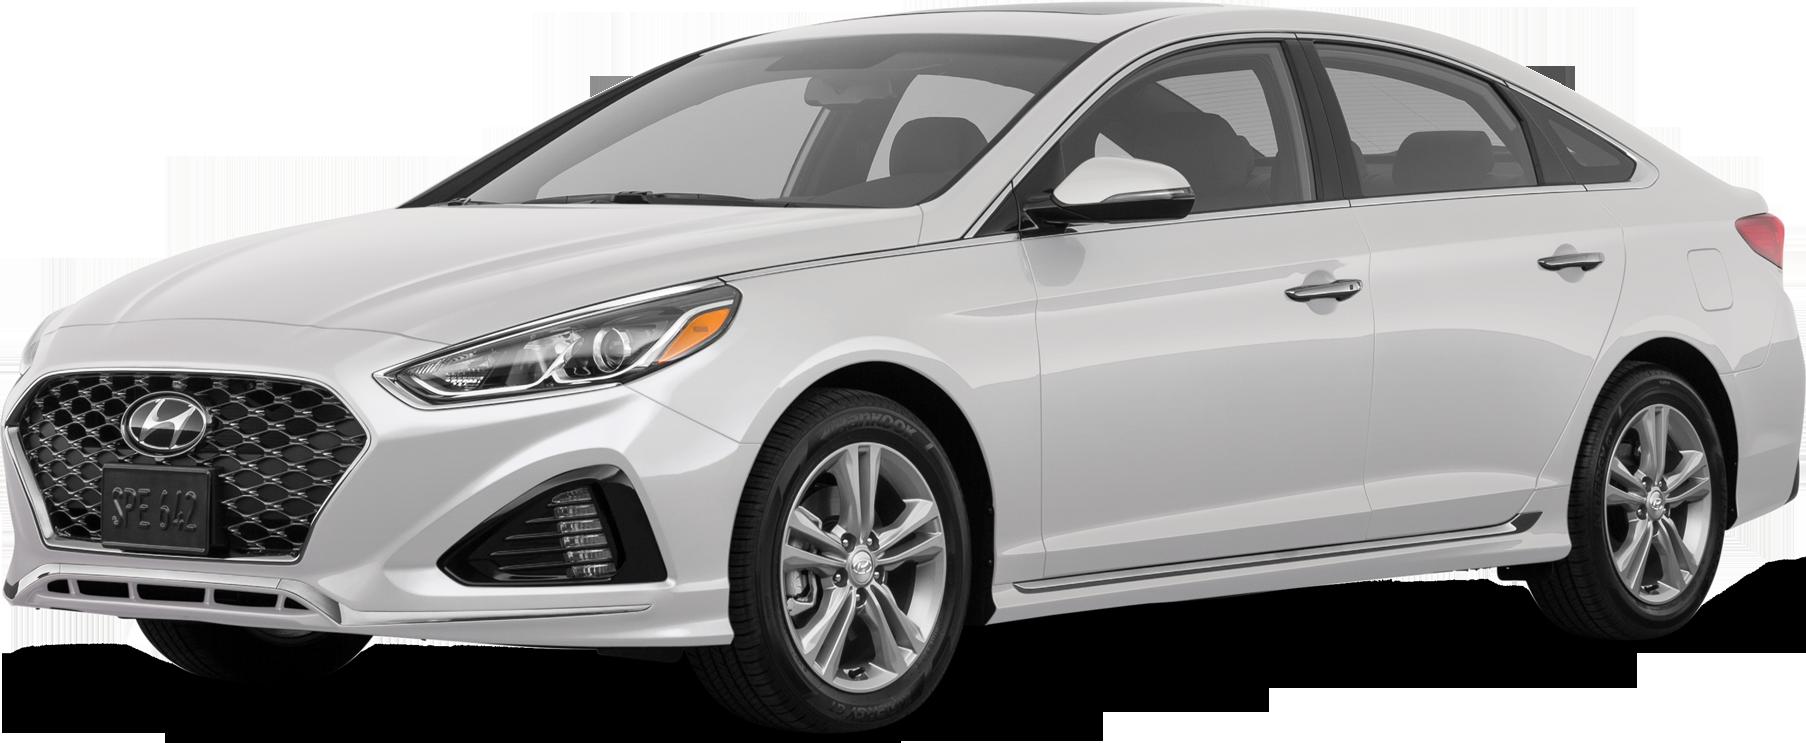 2019 Hyundai Sonata Se Lease Special Imx Auto Group